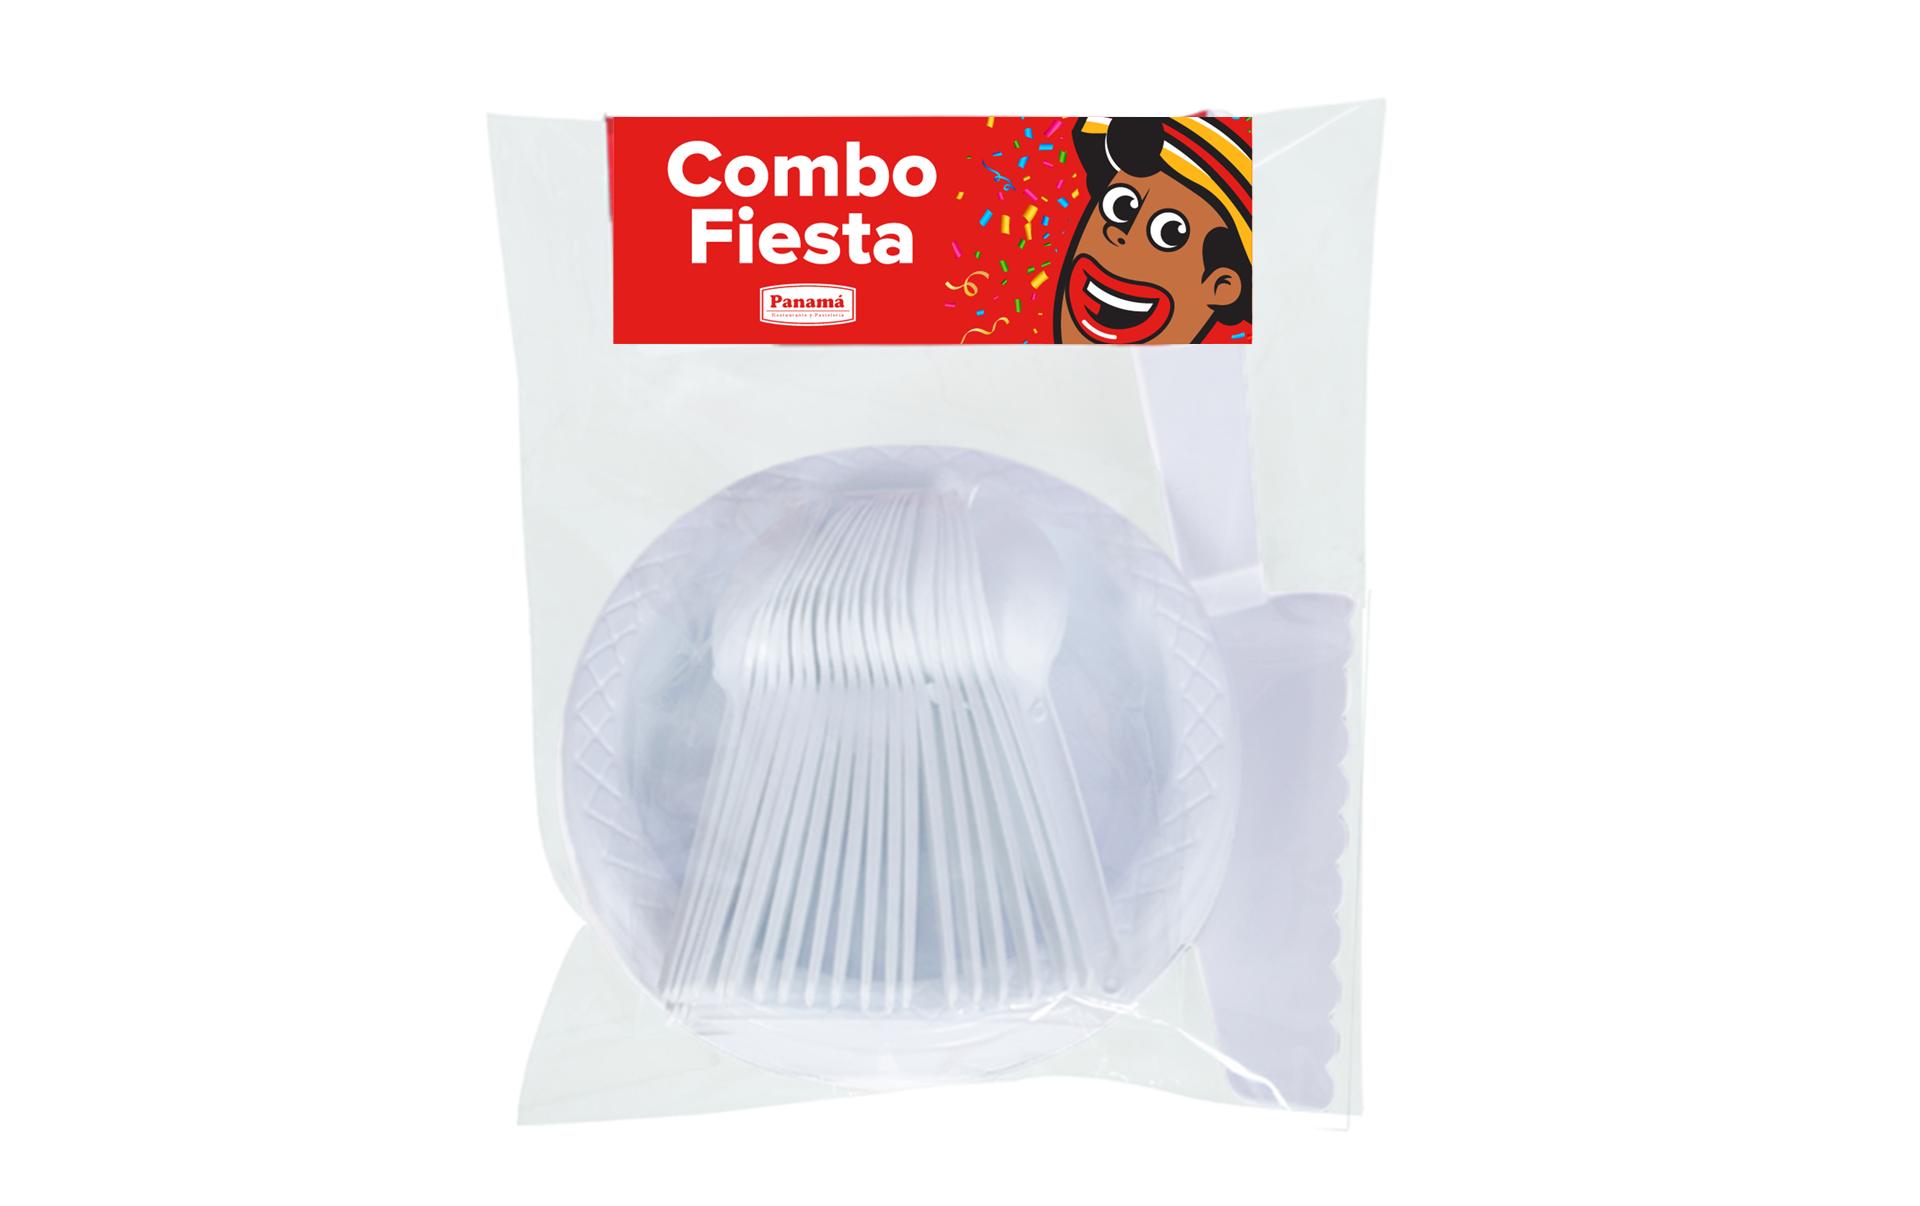 Combo Fiesta